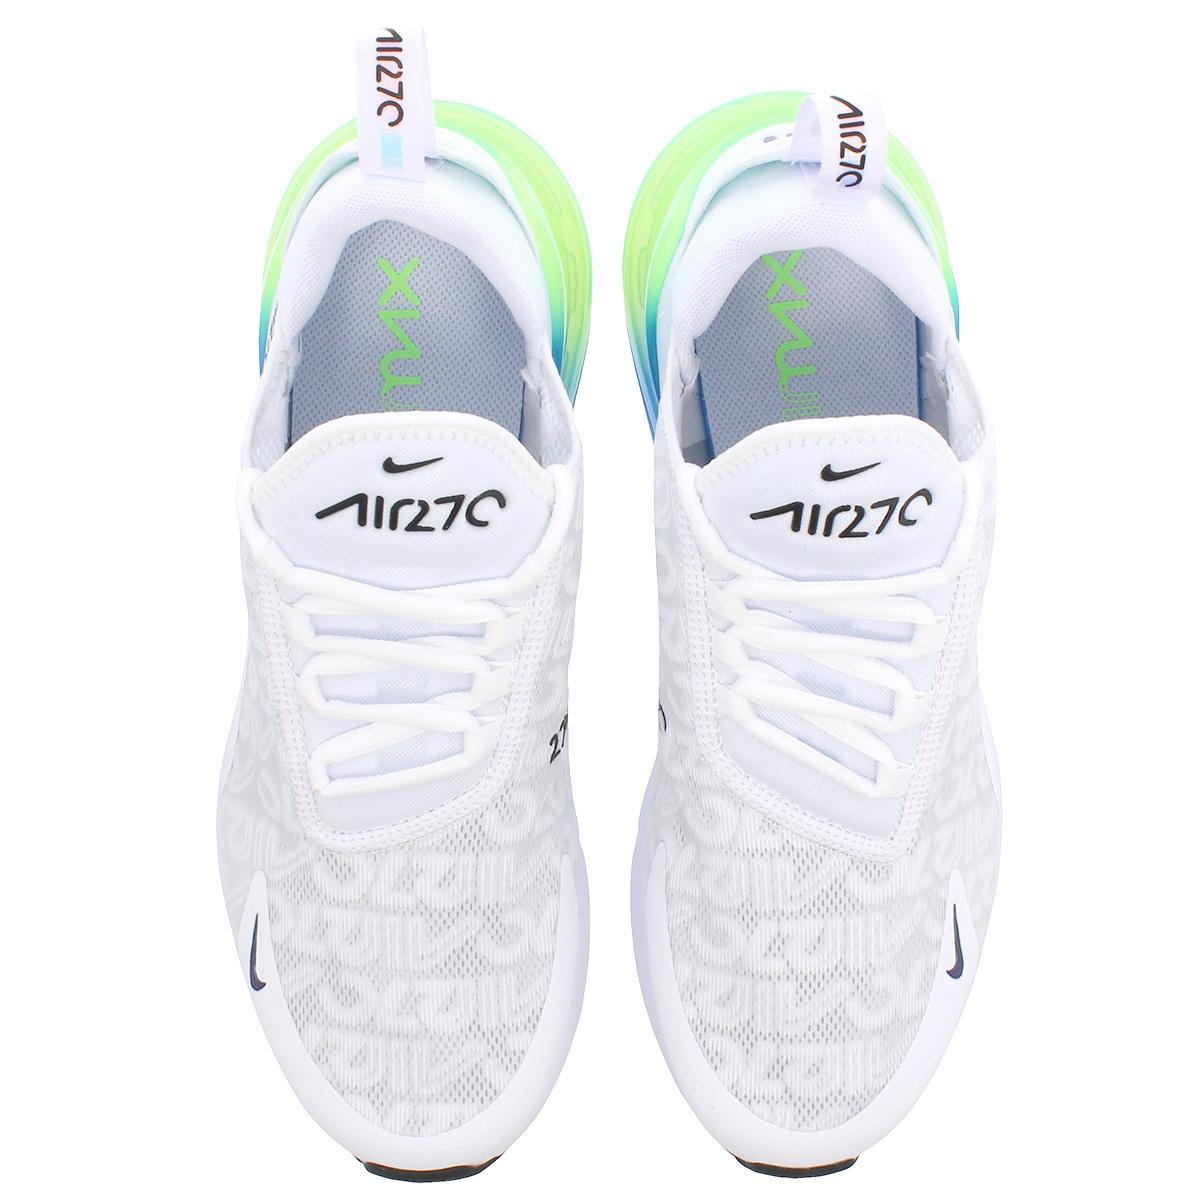 best cheap 80398 b5c24 NIKE AIR MAX 270 SE Kie Ney AMAX 270 SE WHITE LIME BLAST PHOTO BLUE WHITE  aq9164-100